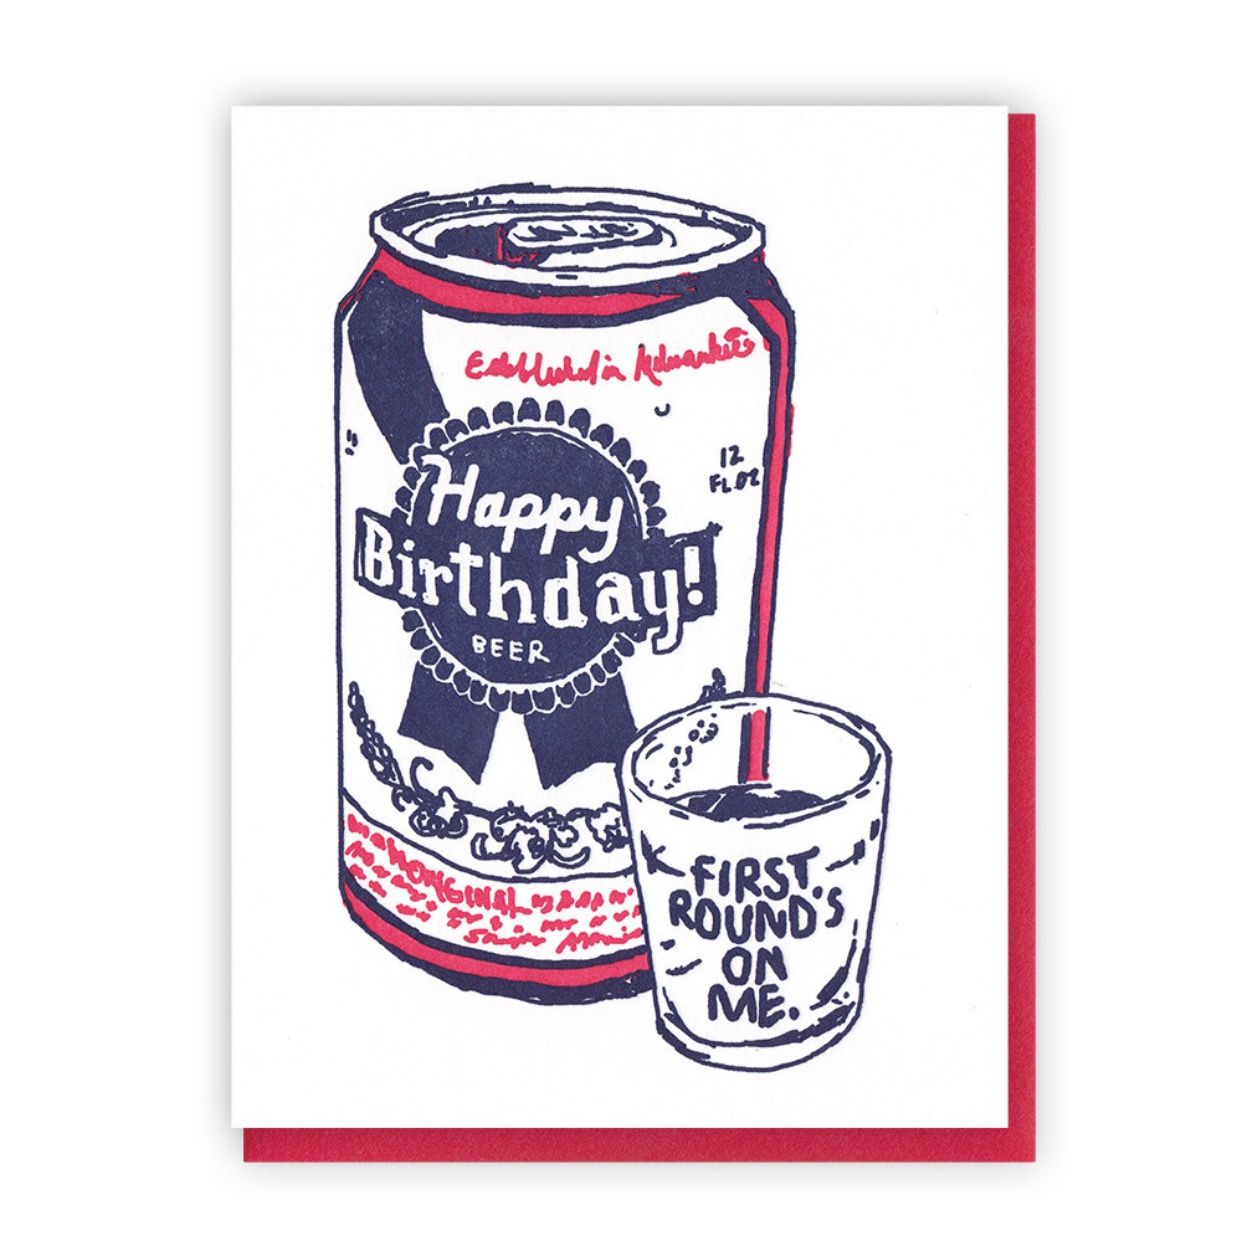 Pabst blue ribbon birthday card Happy birthday beer